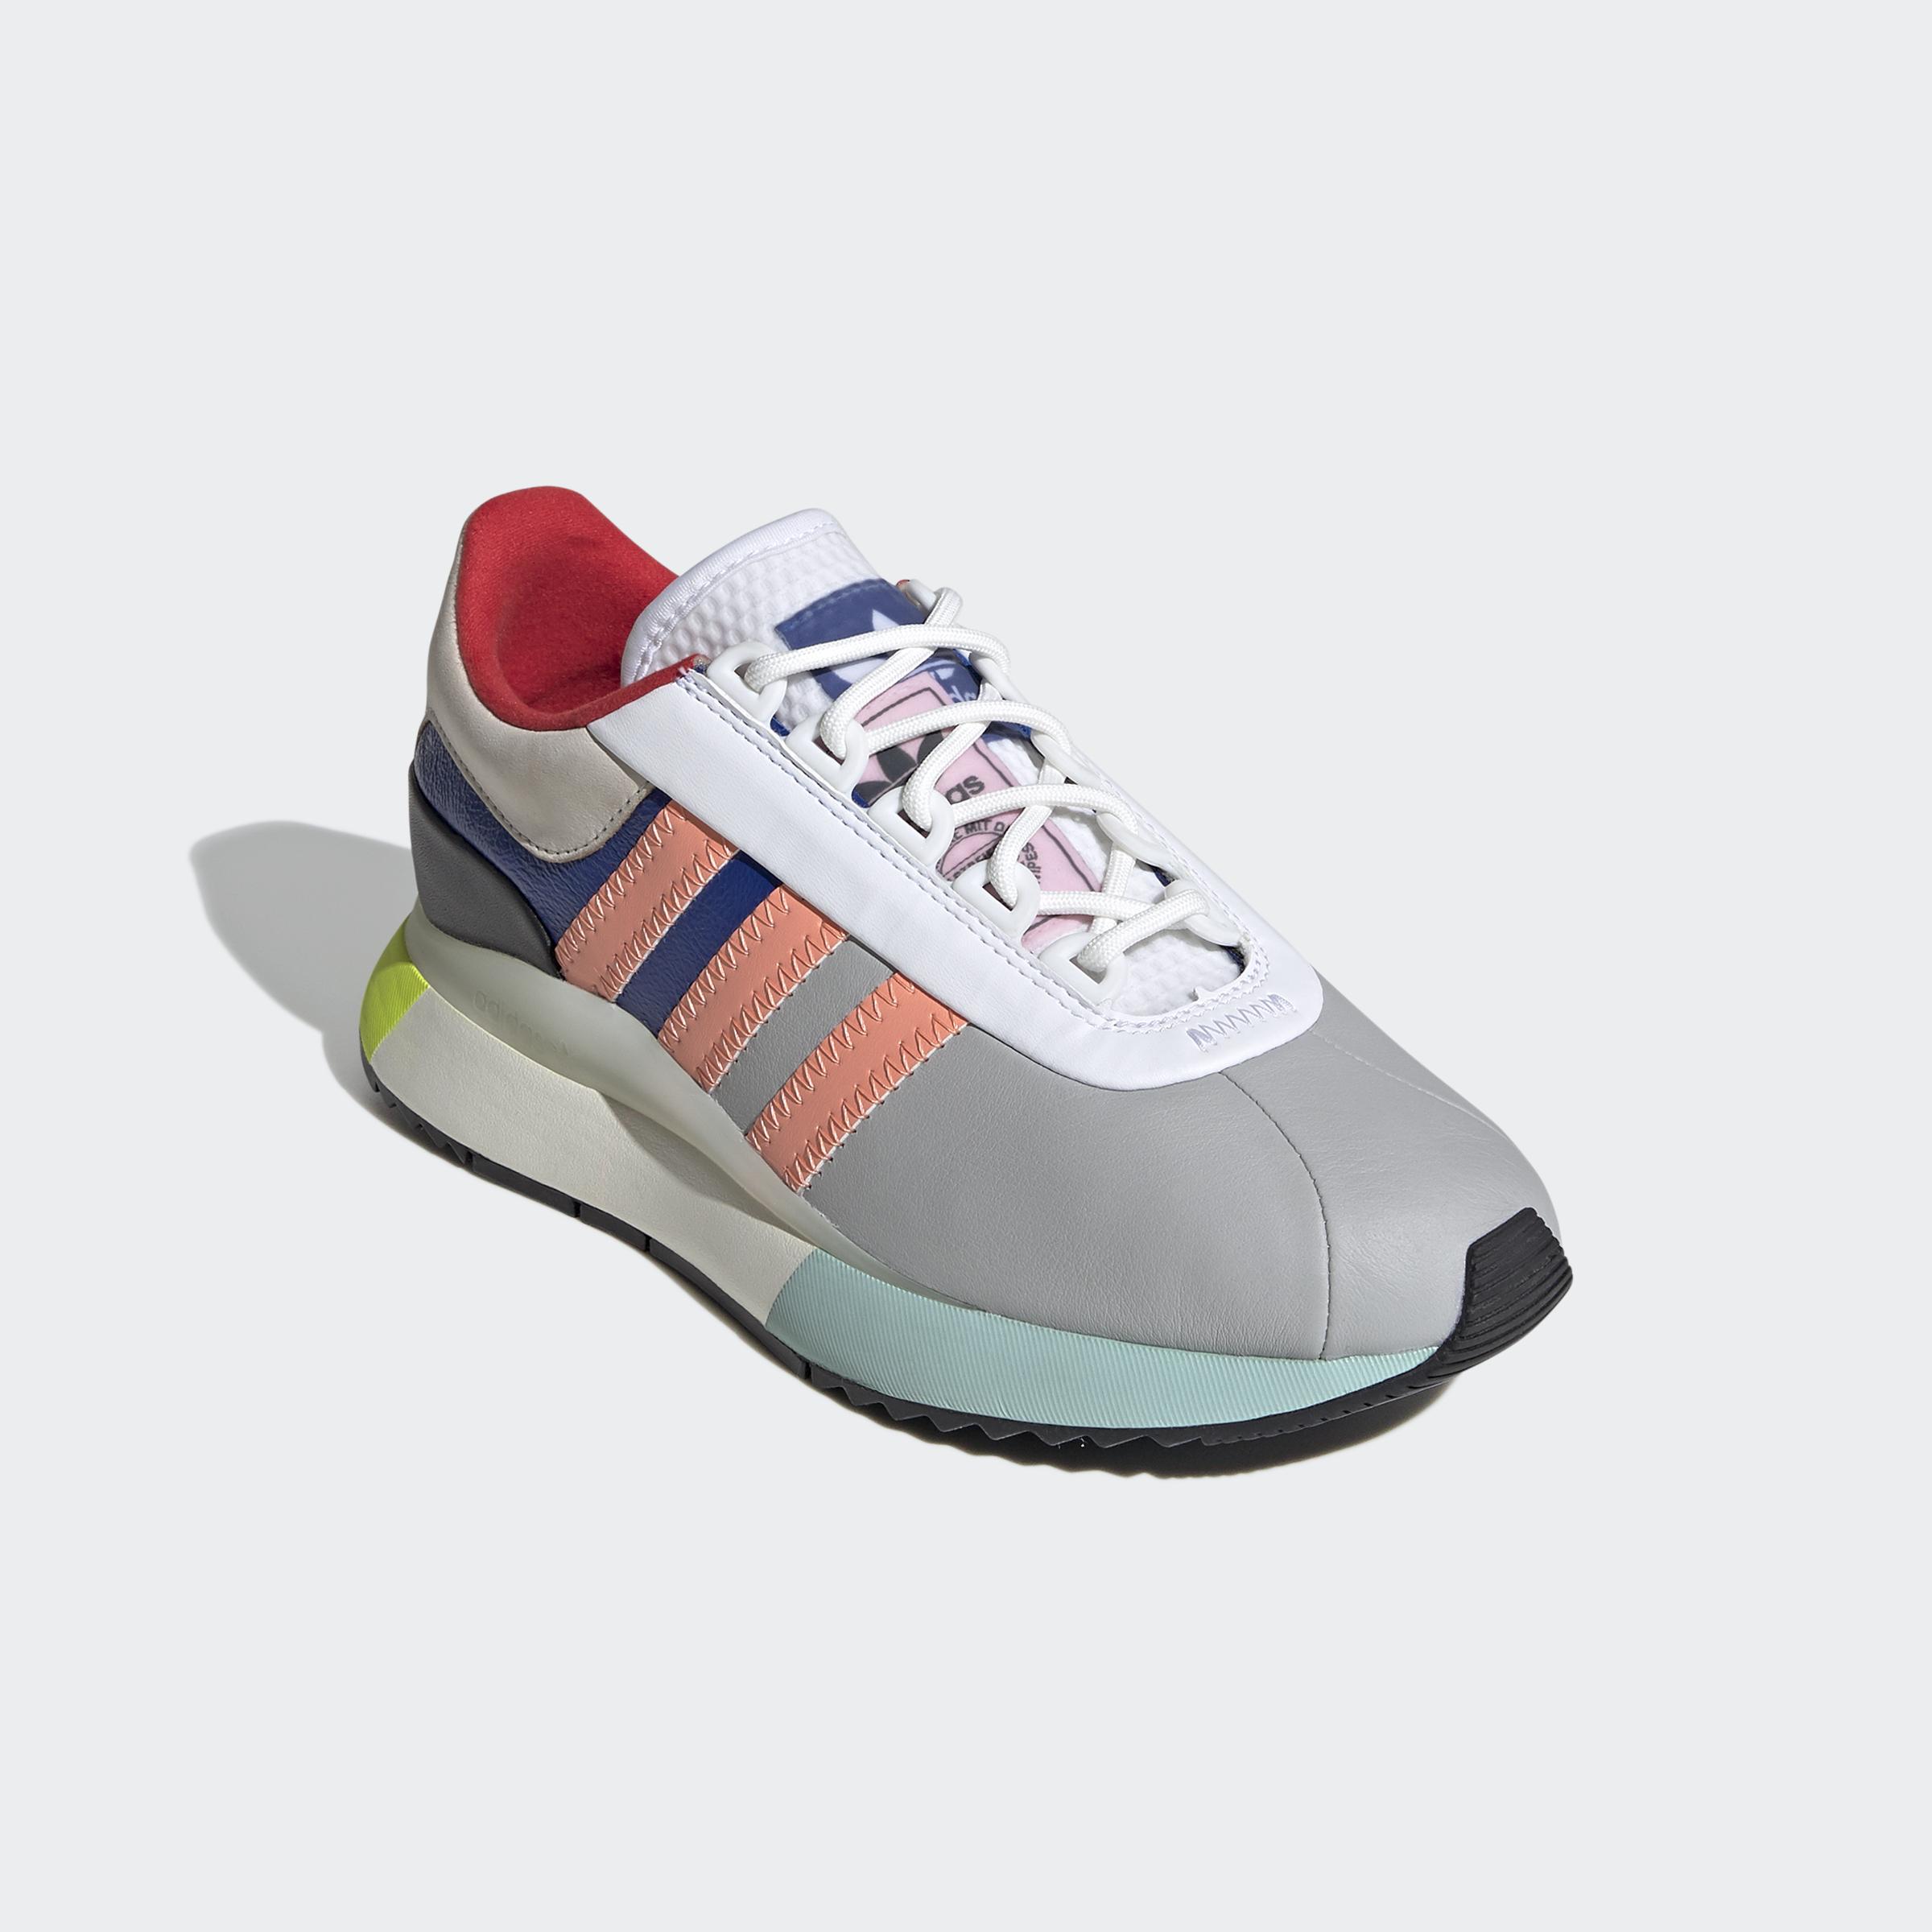 adidas SL Andridge Shoes Women's Athletic & Sneakers   eBay